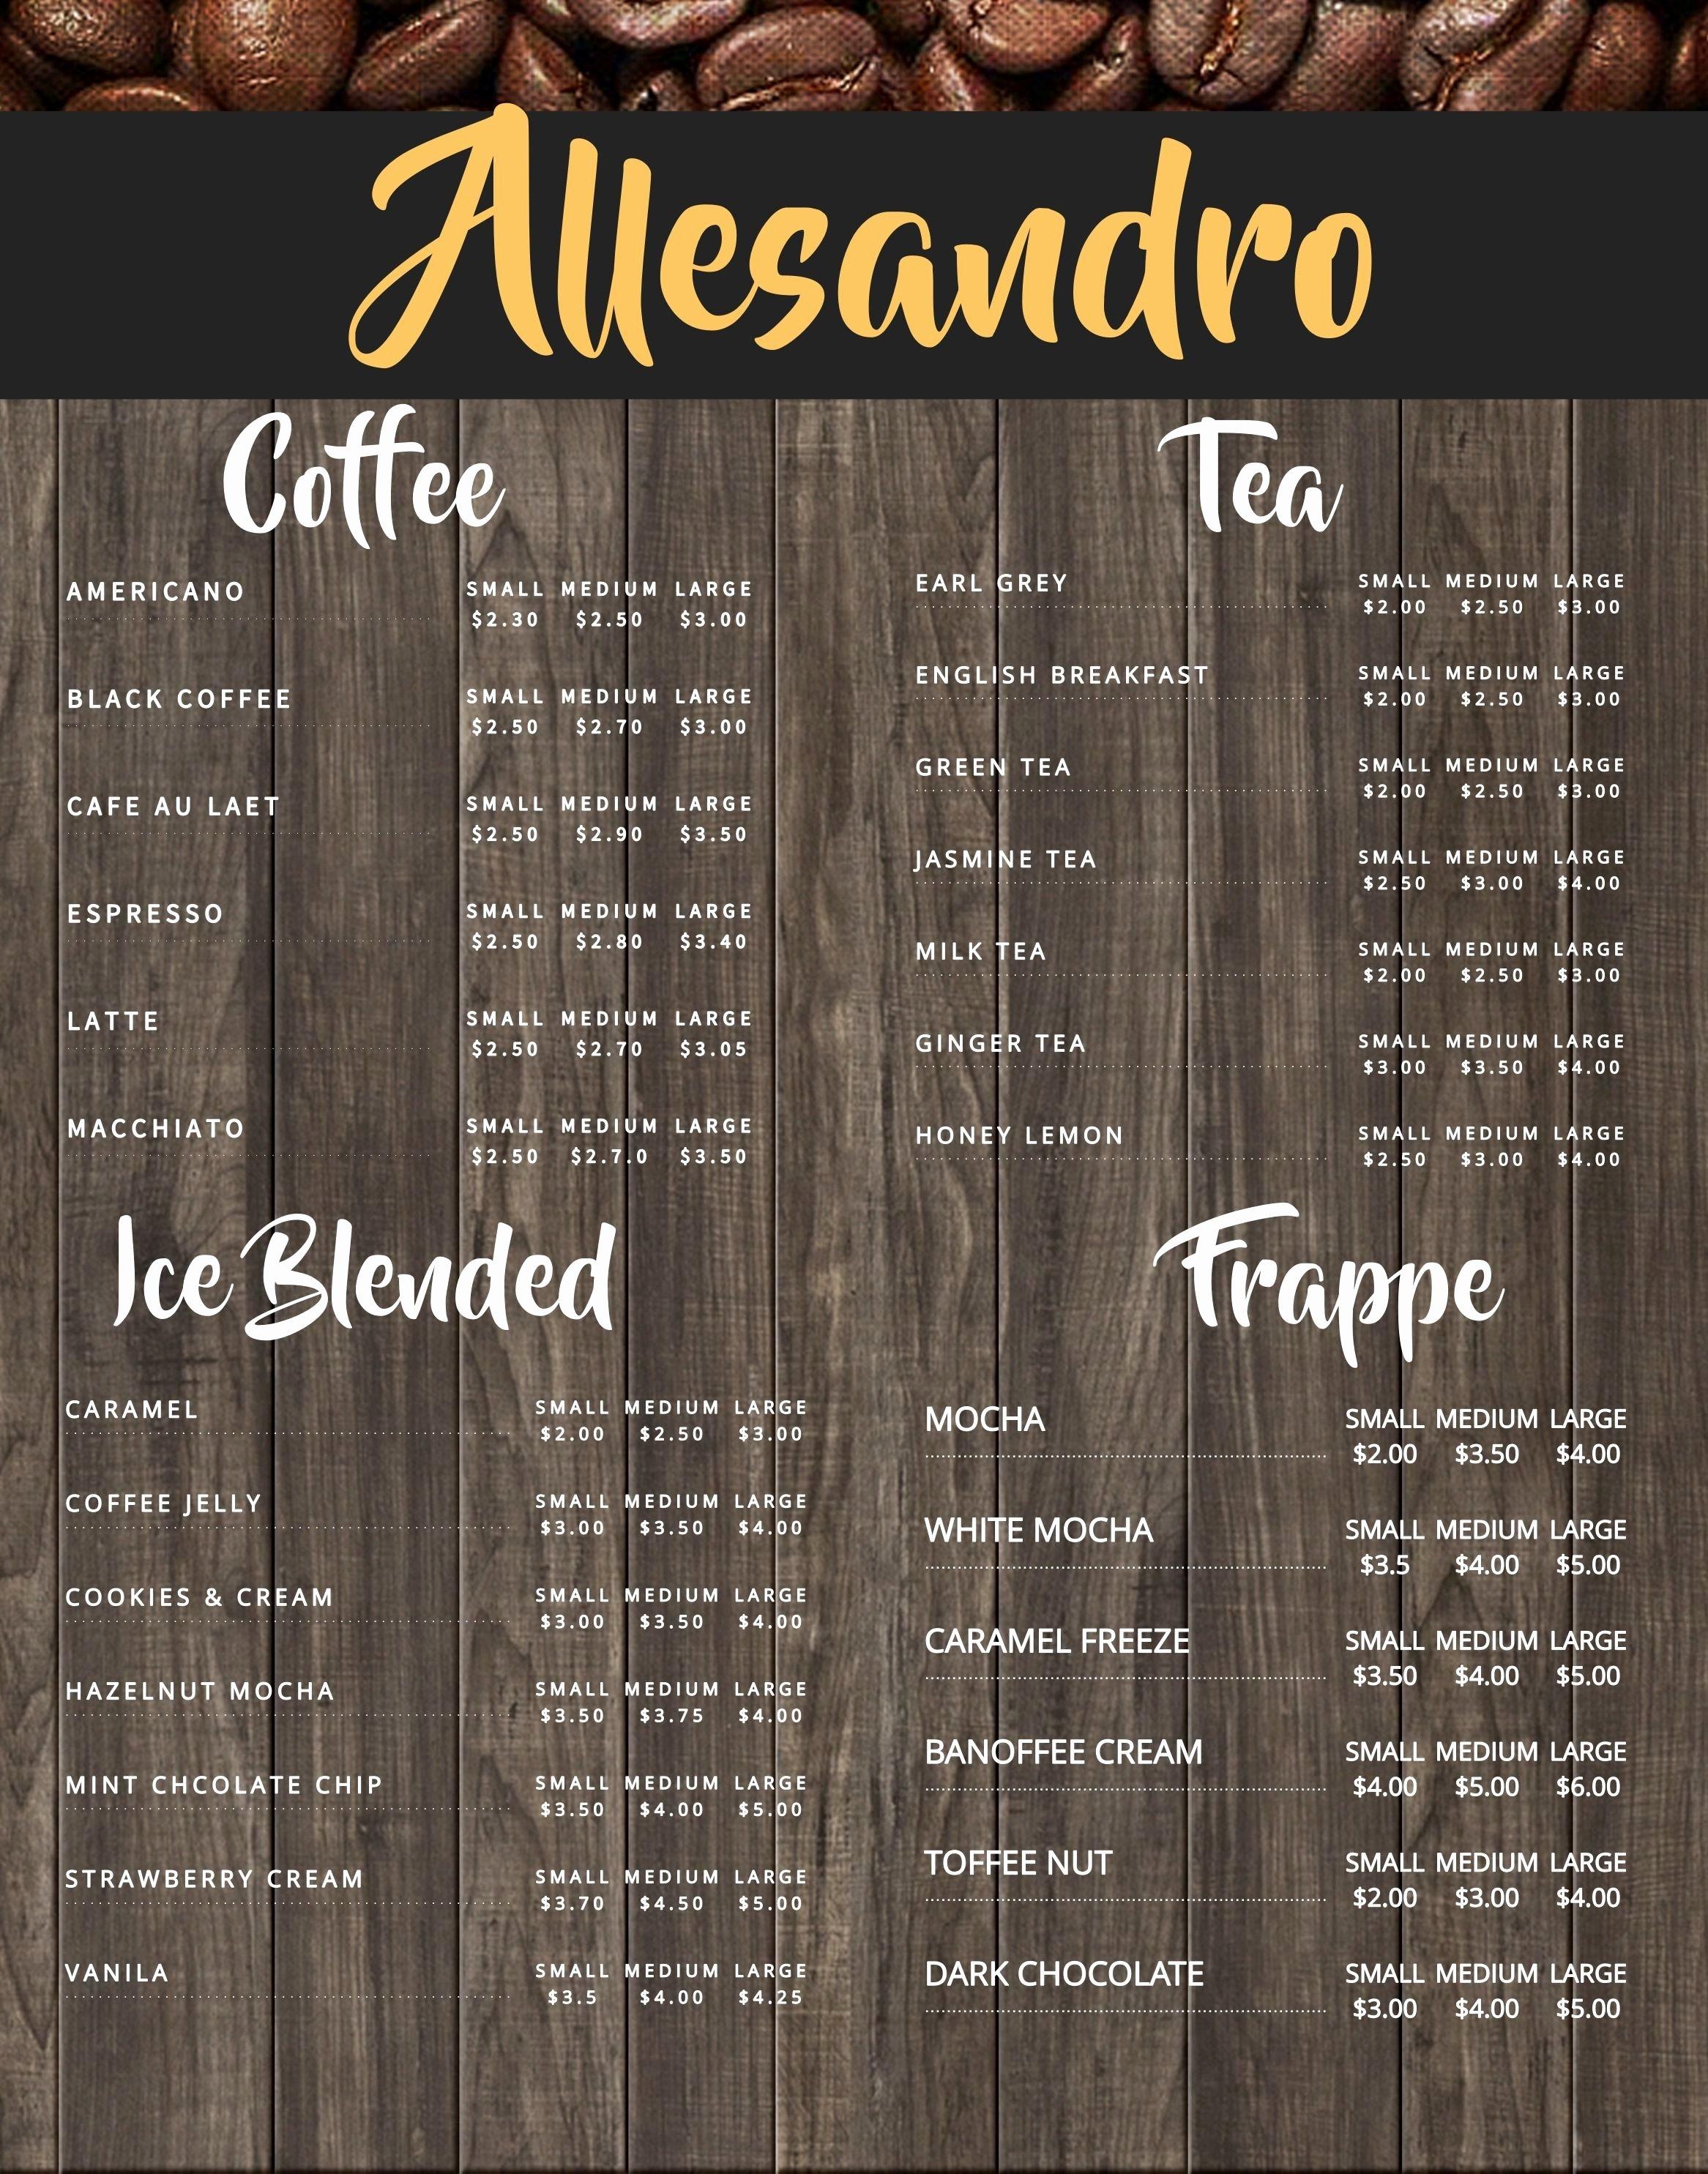 Coffee Shop Menu Template Unique Coffee Shop Menu Board Design Template to Customize